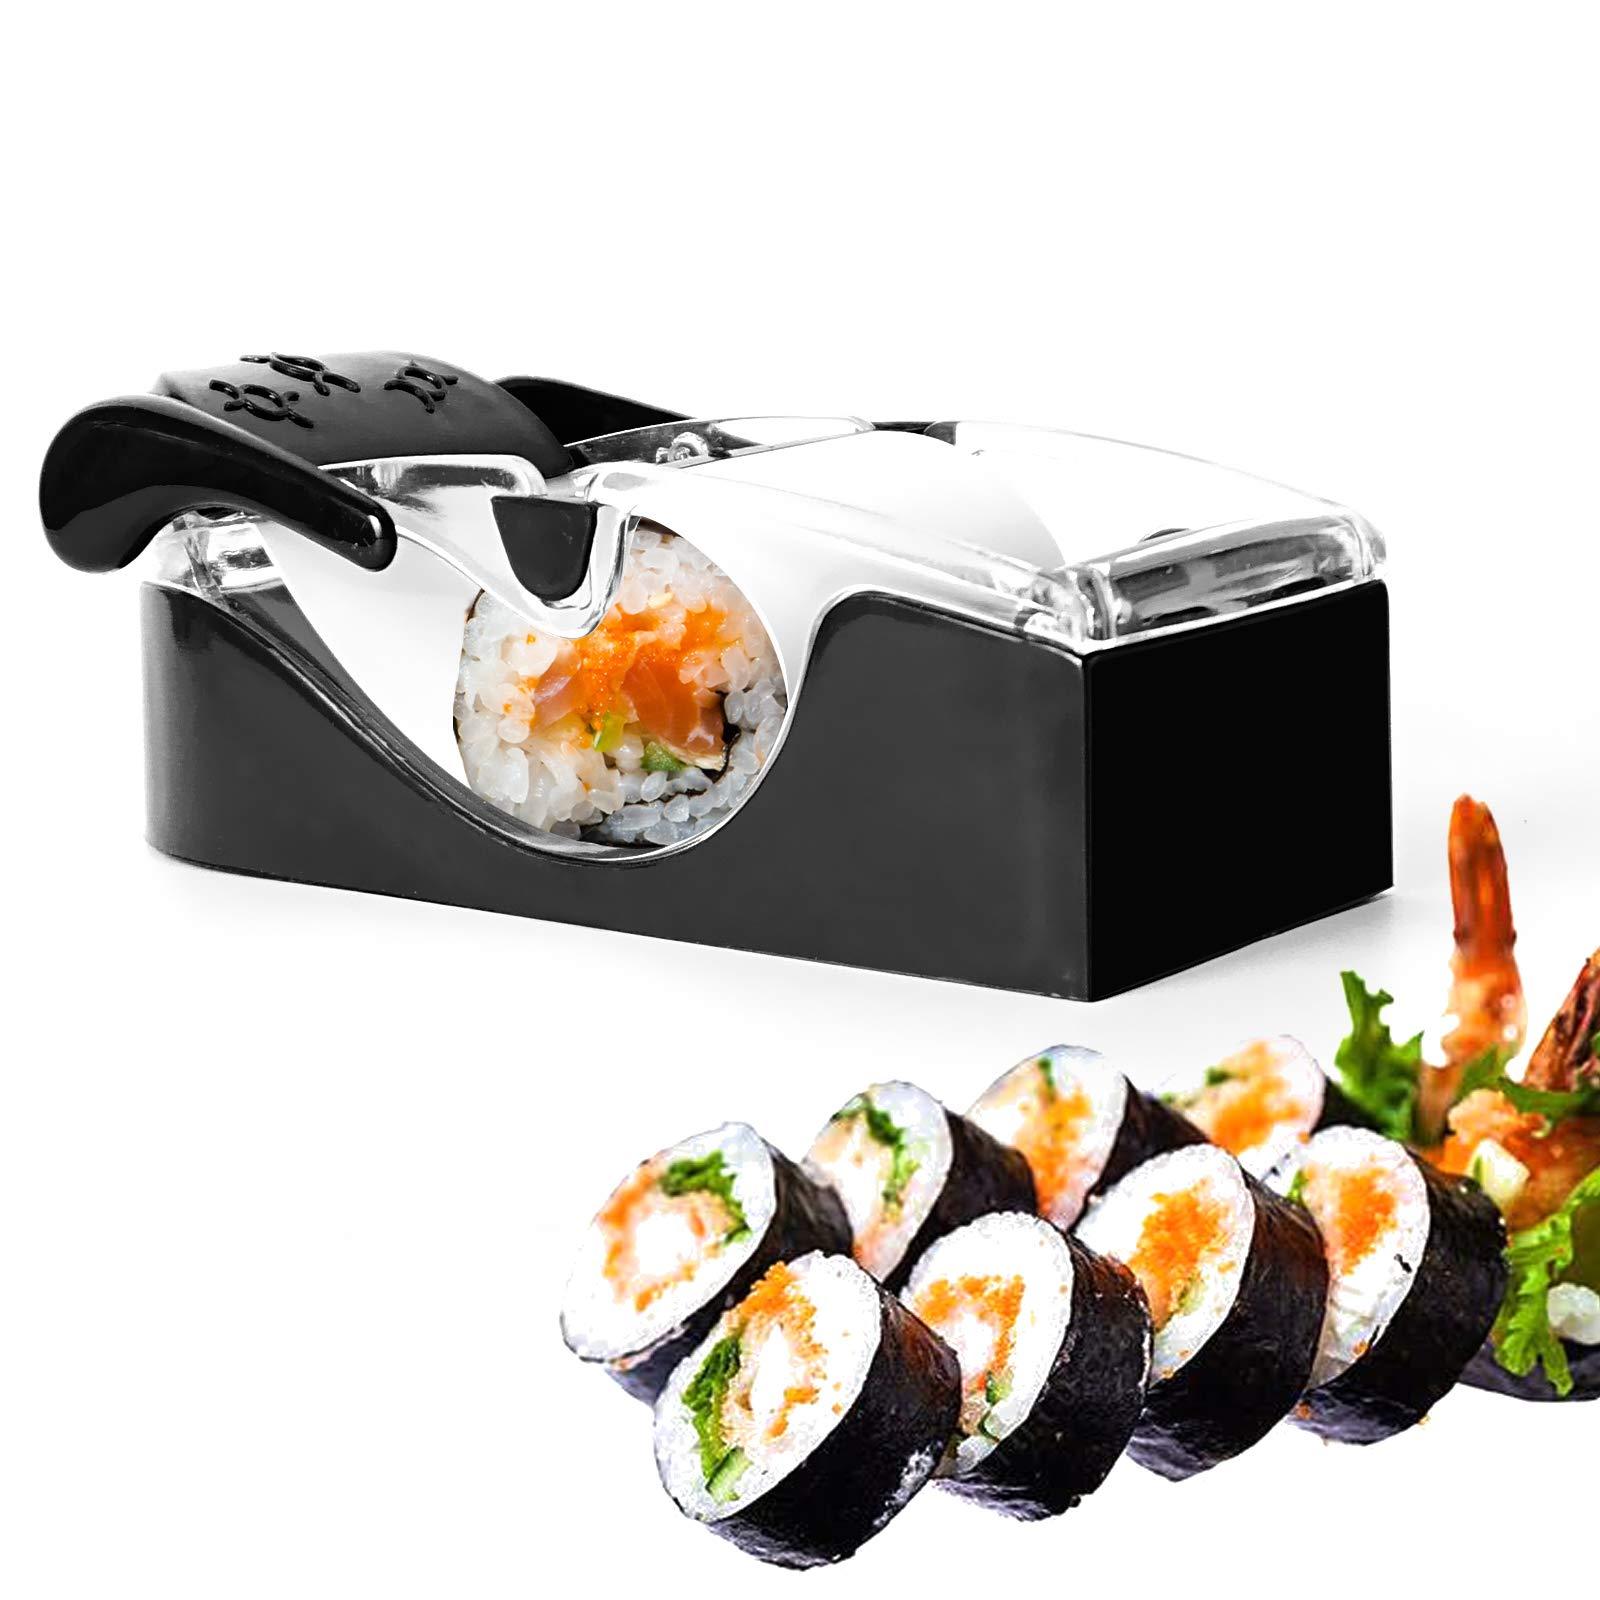 HAWORTHS Sushi Maker Roller Equipment Perfect Roll Sushi Machine DIY Easy Kitchen Magic Gadget kitchen Accessories